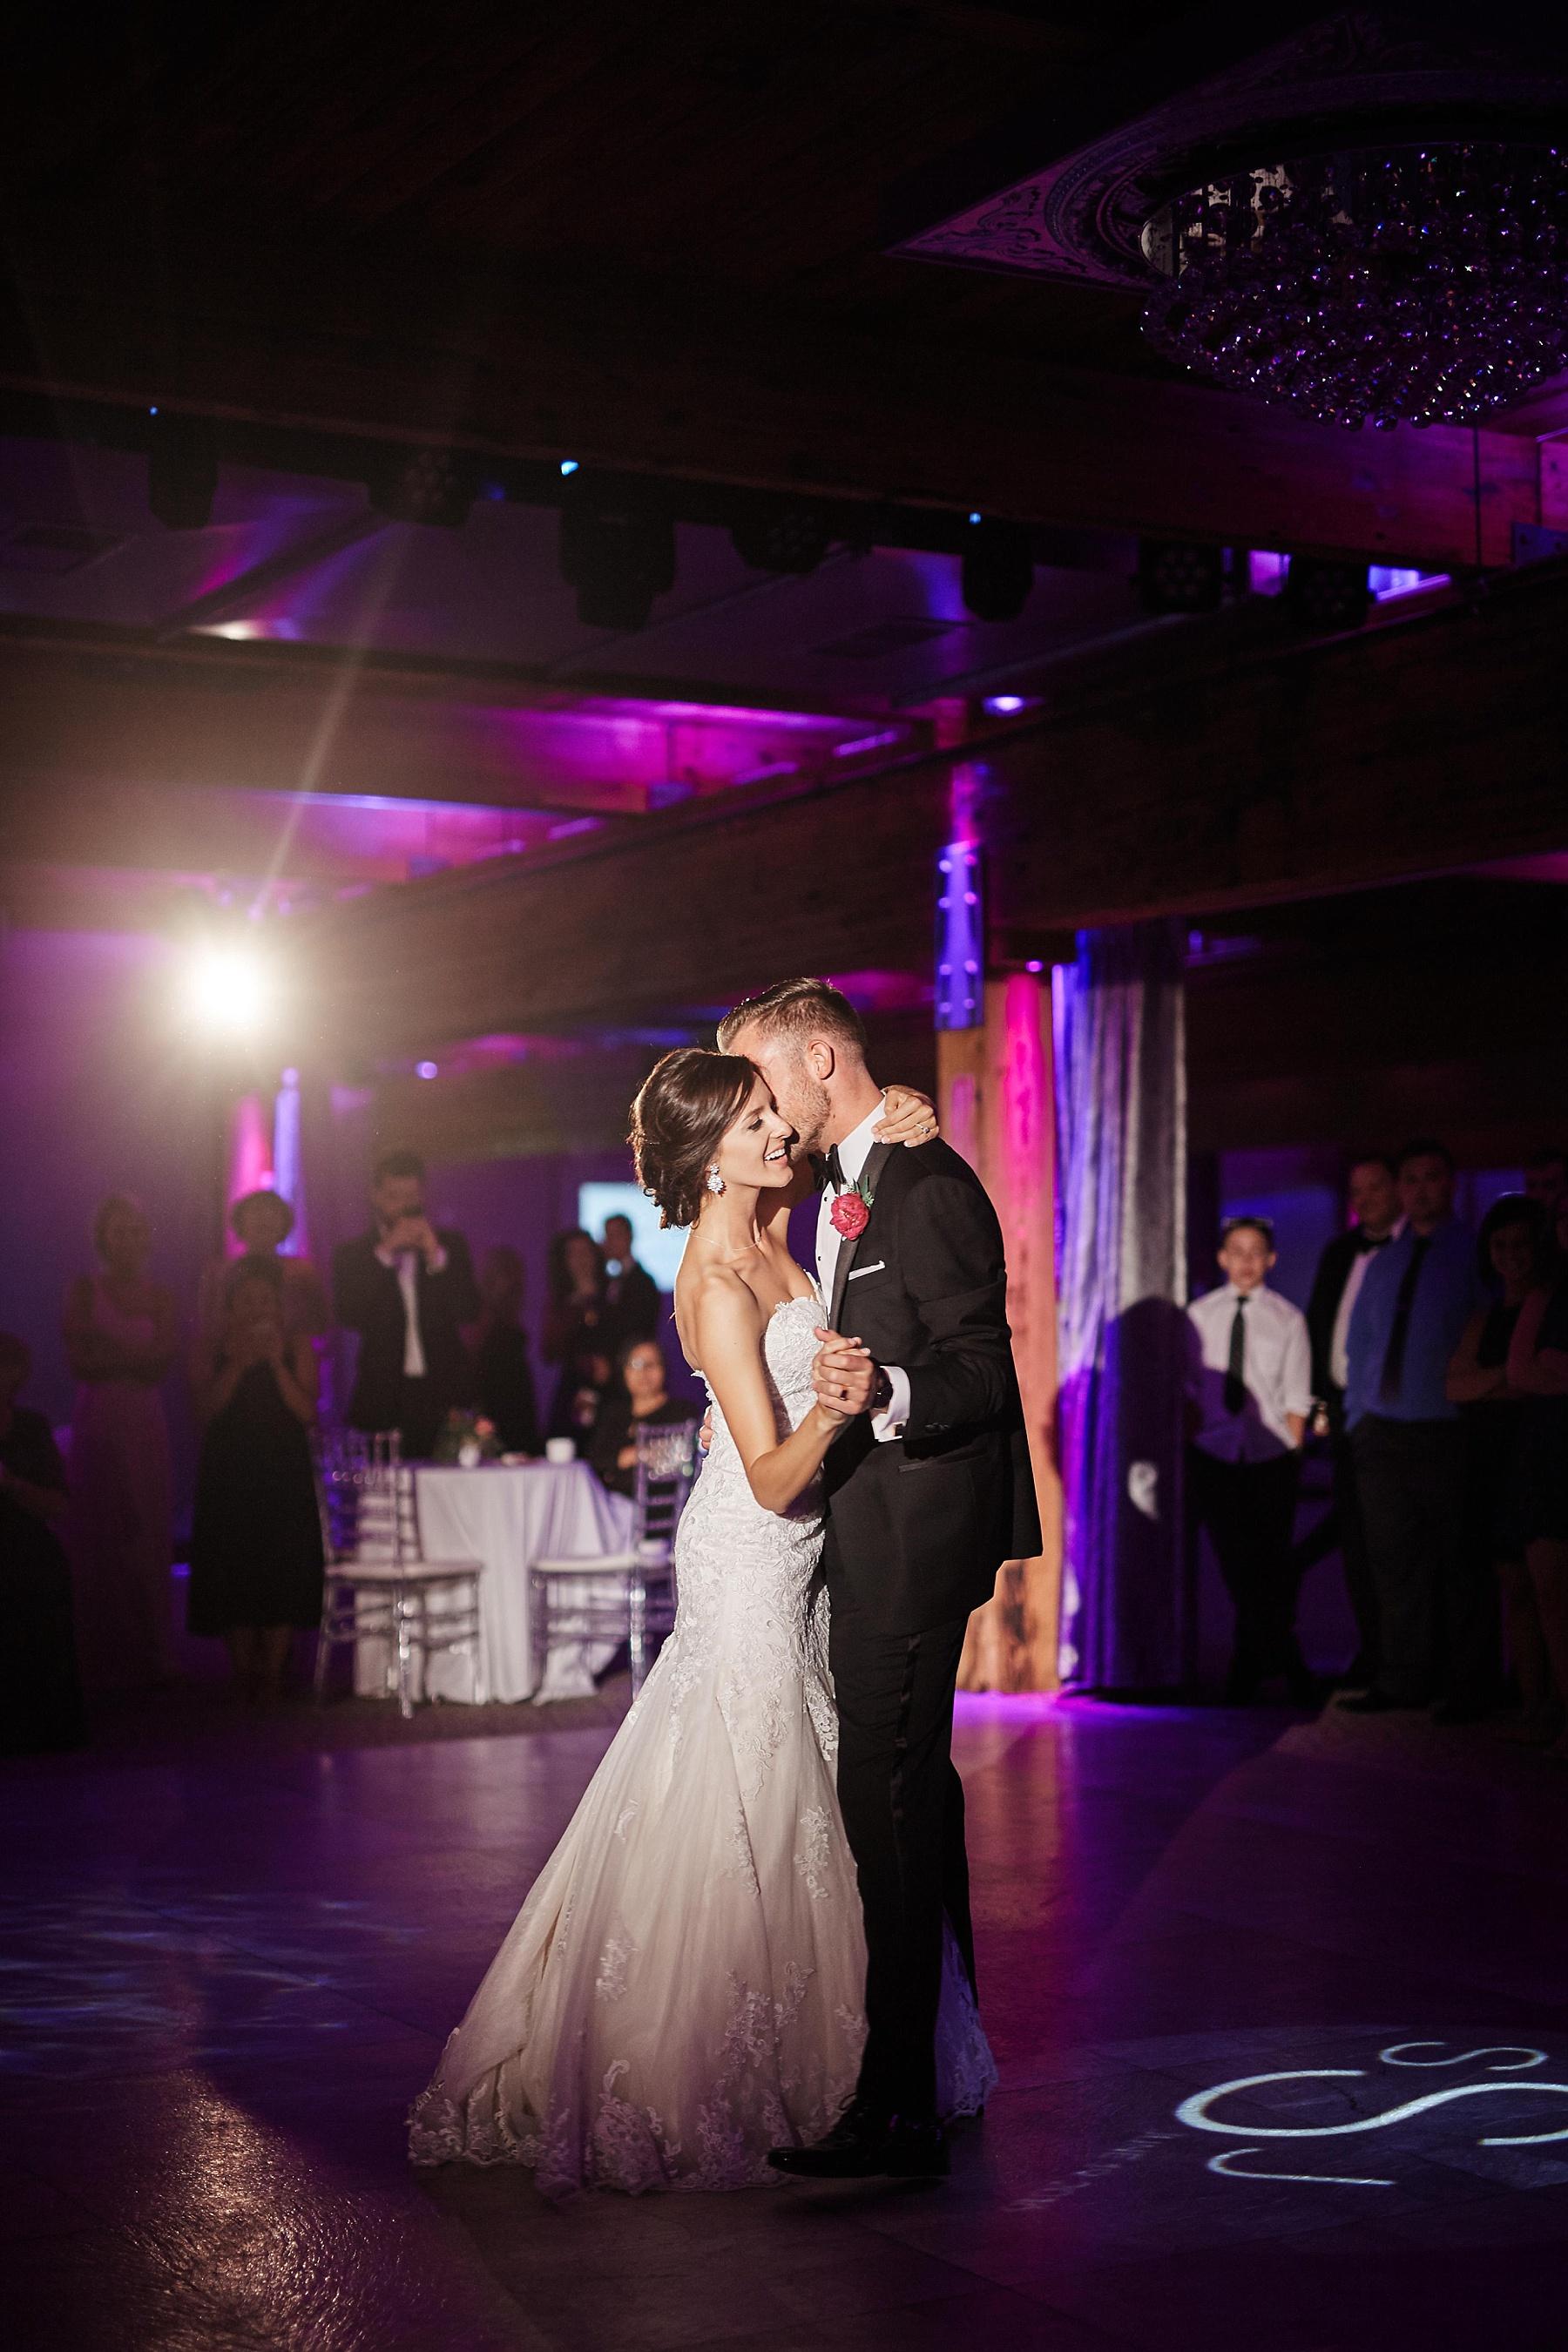 ABULAE-Wedding-Saint-paul-MN-Josh-Sofia-Wedding-Mears-Park_0844.jpg